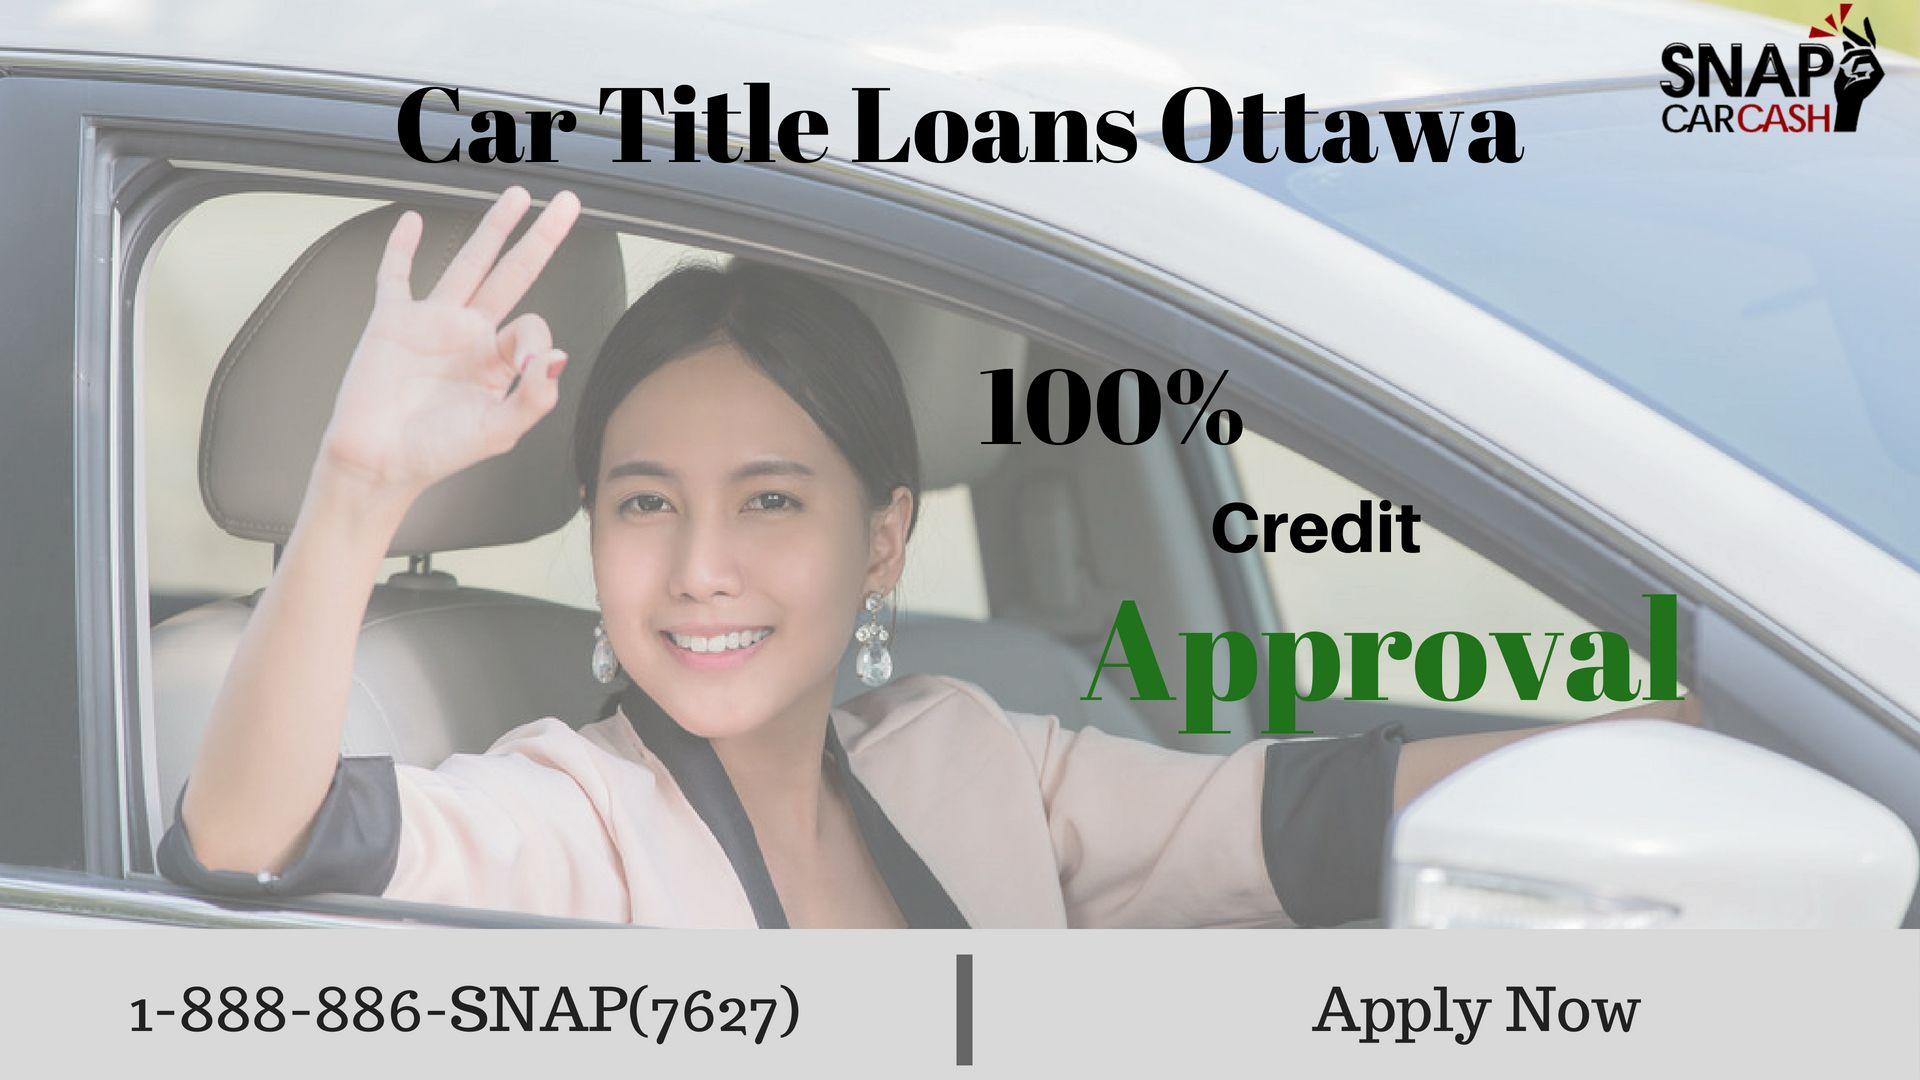 Car Title Loans in and around Ottawa Bad credit car loan